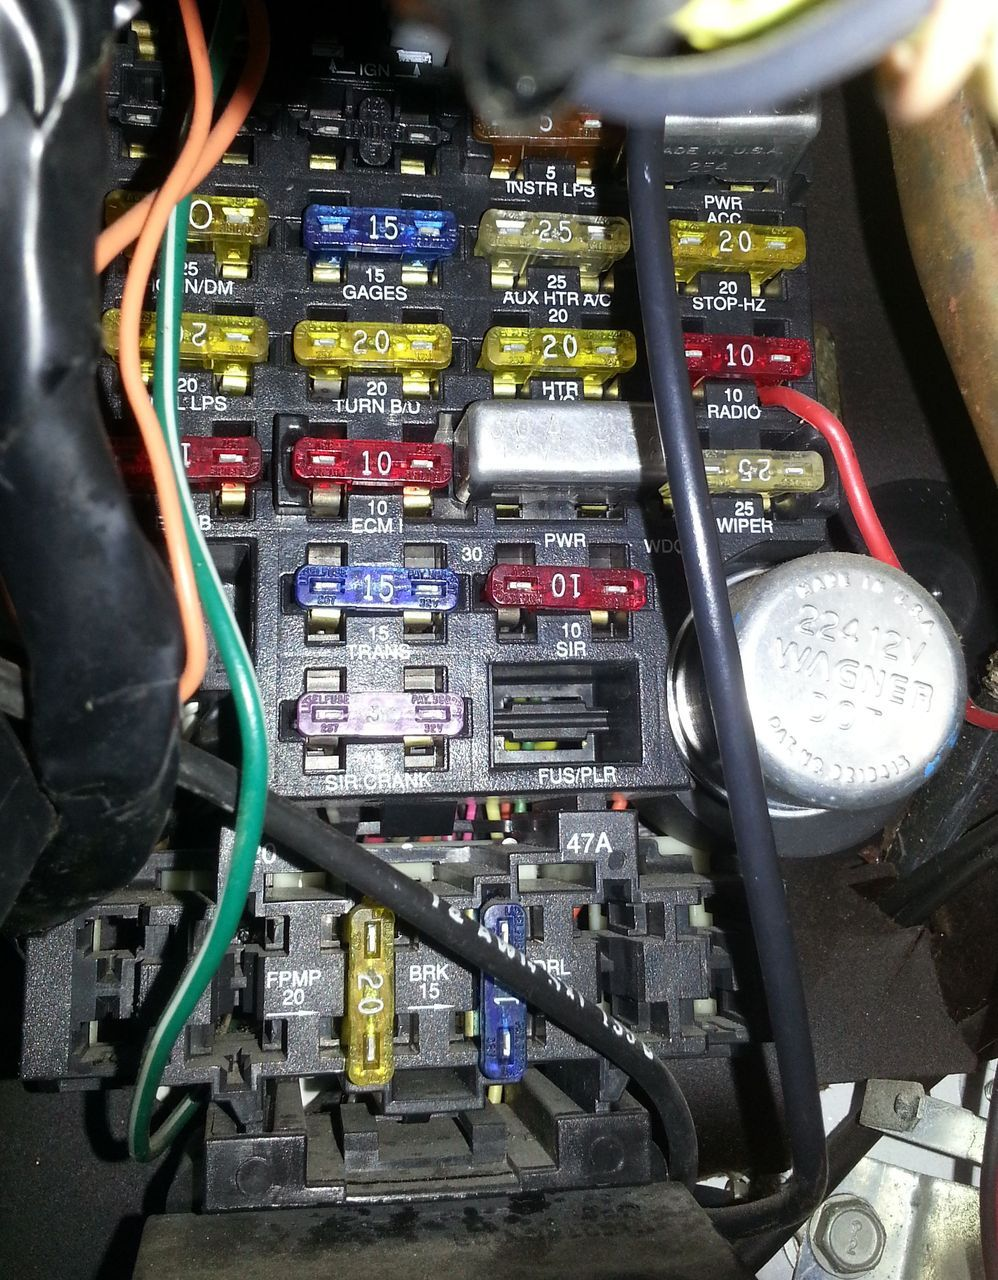 Tremendous 1995 Chevrolet Van Fuse Box Location Wiring Diagram Data Wiring Cloud Intelaidewilluminateatxorg